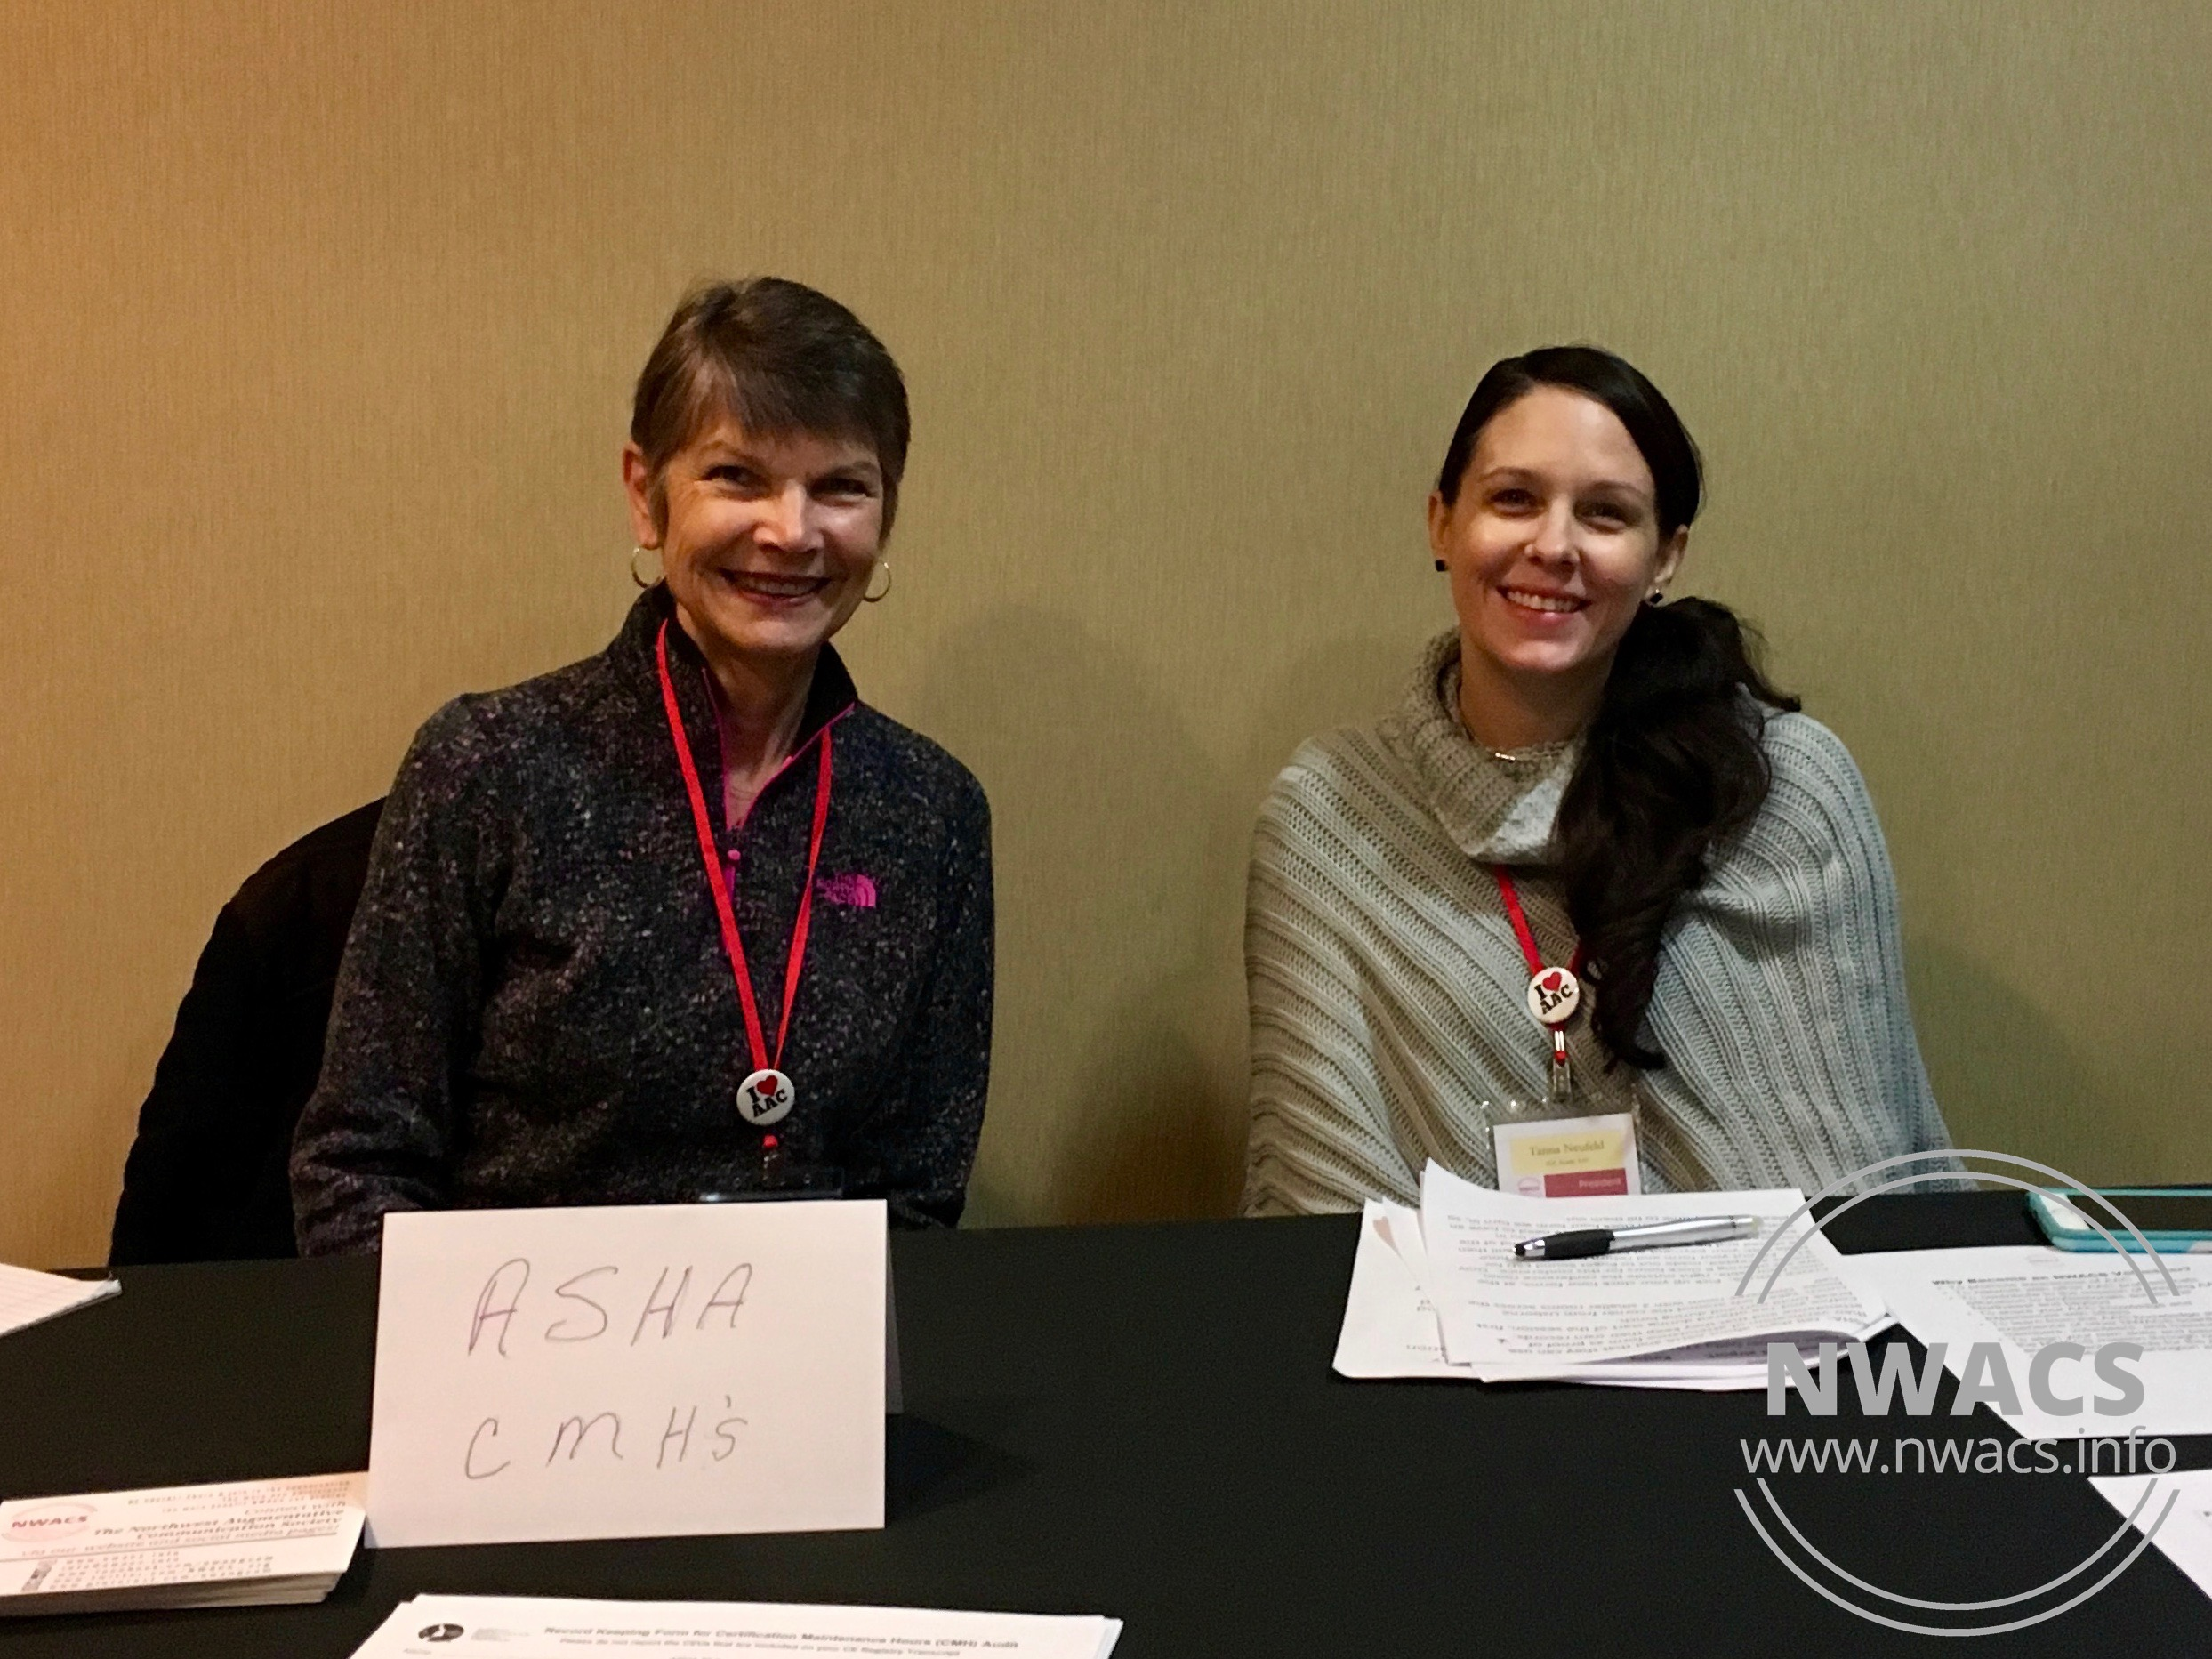 NWACS Board members Kathy & Tanna